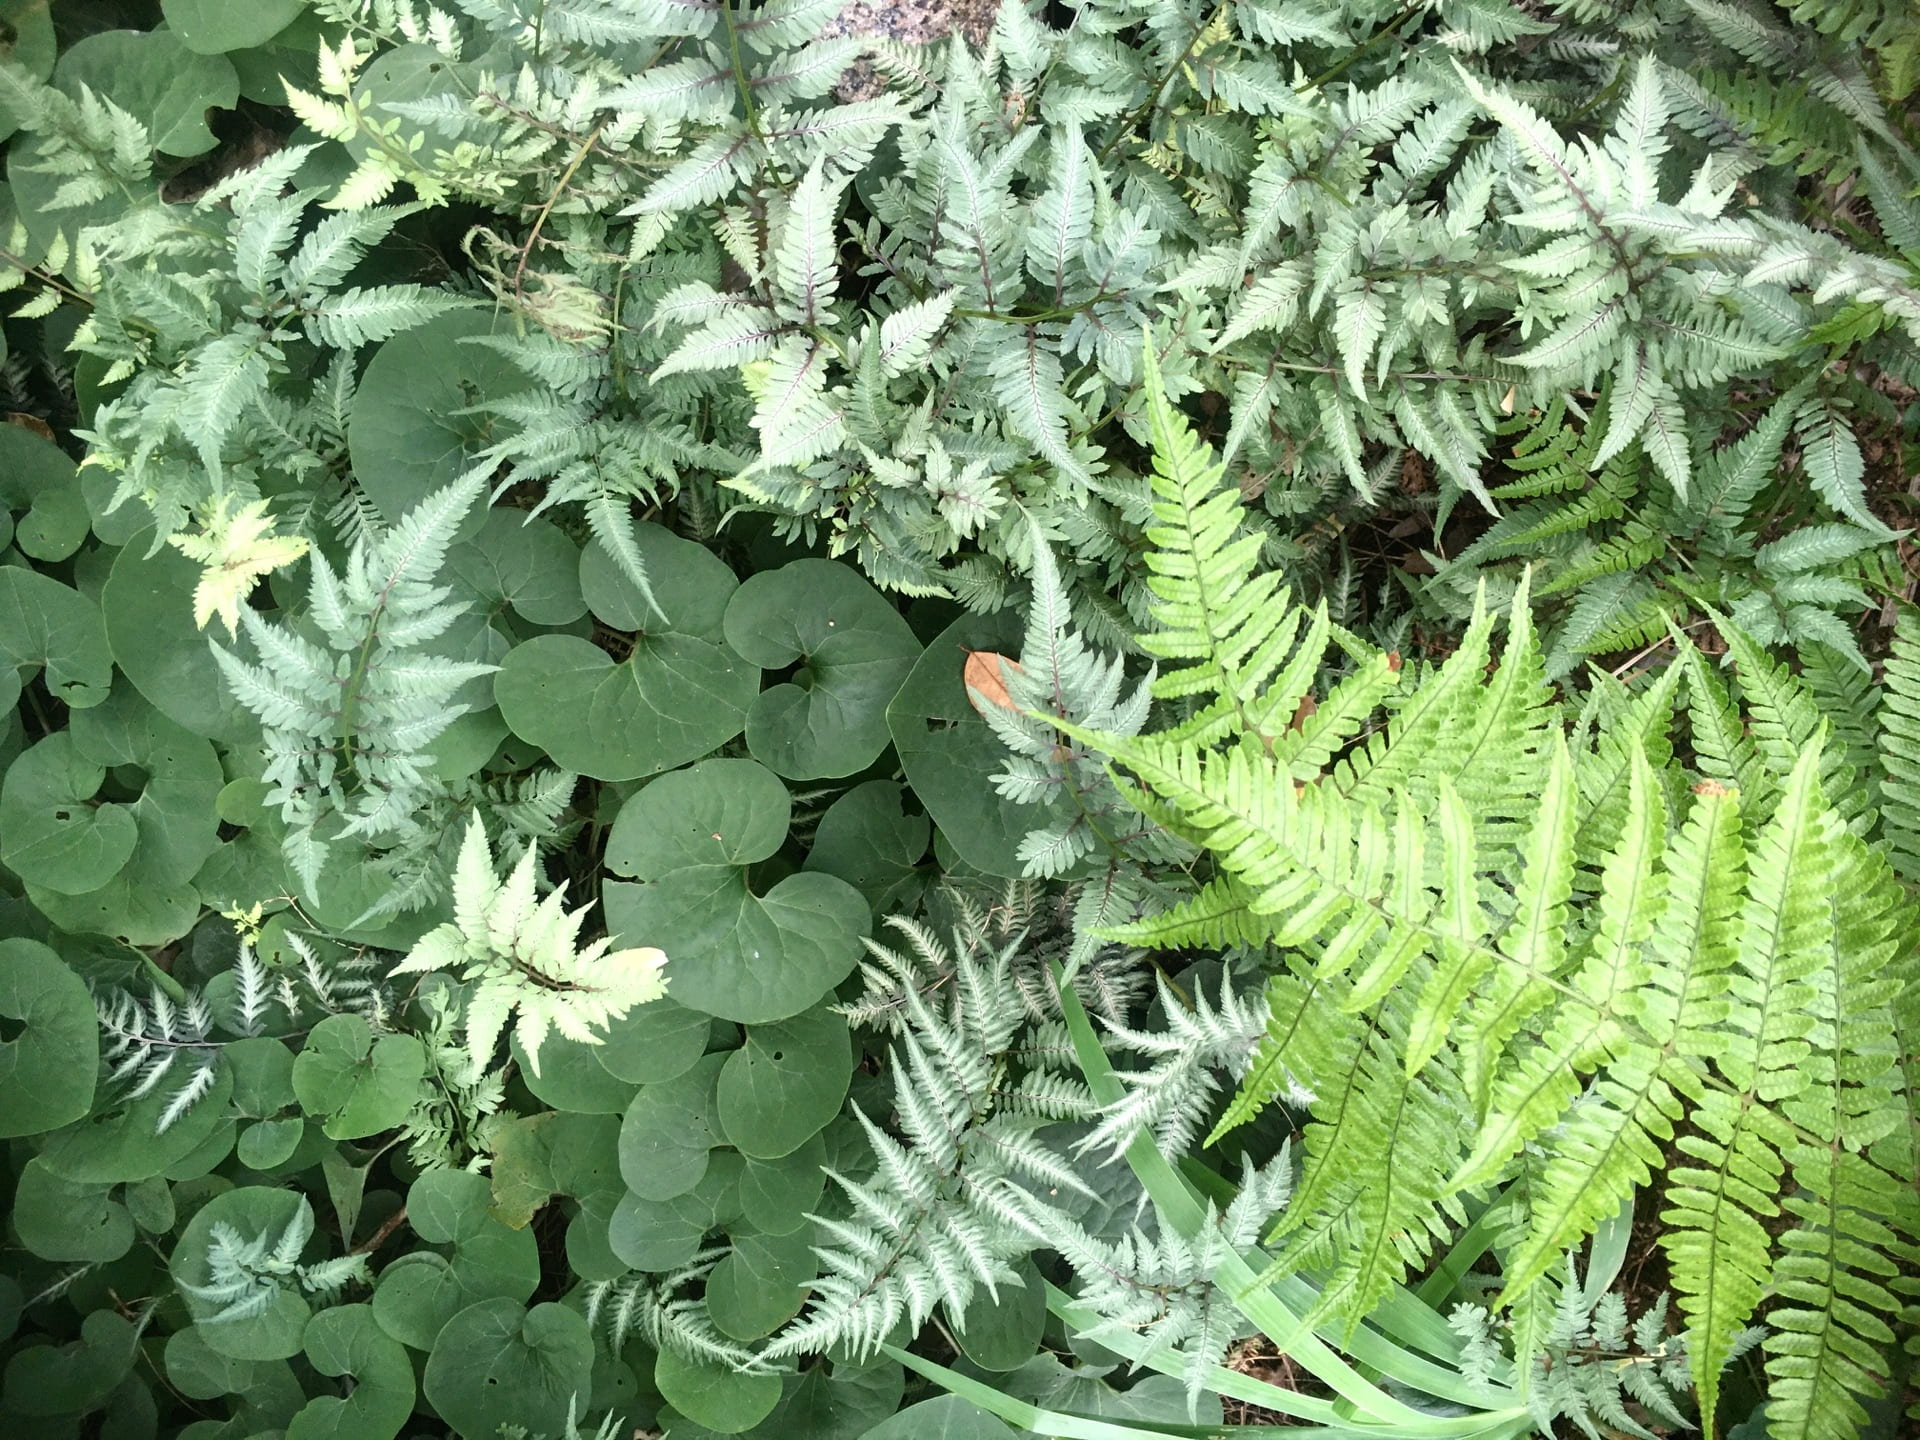 A spectrum of greens created by Asarum canadense, Athyrium niponicum var. pictum, and Dryopteris sp.